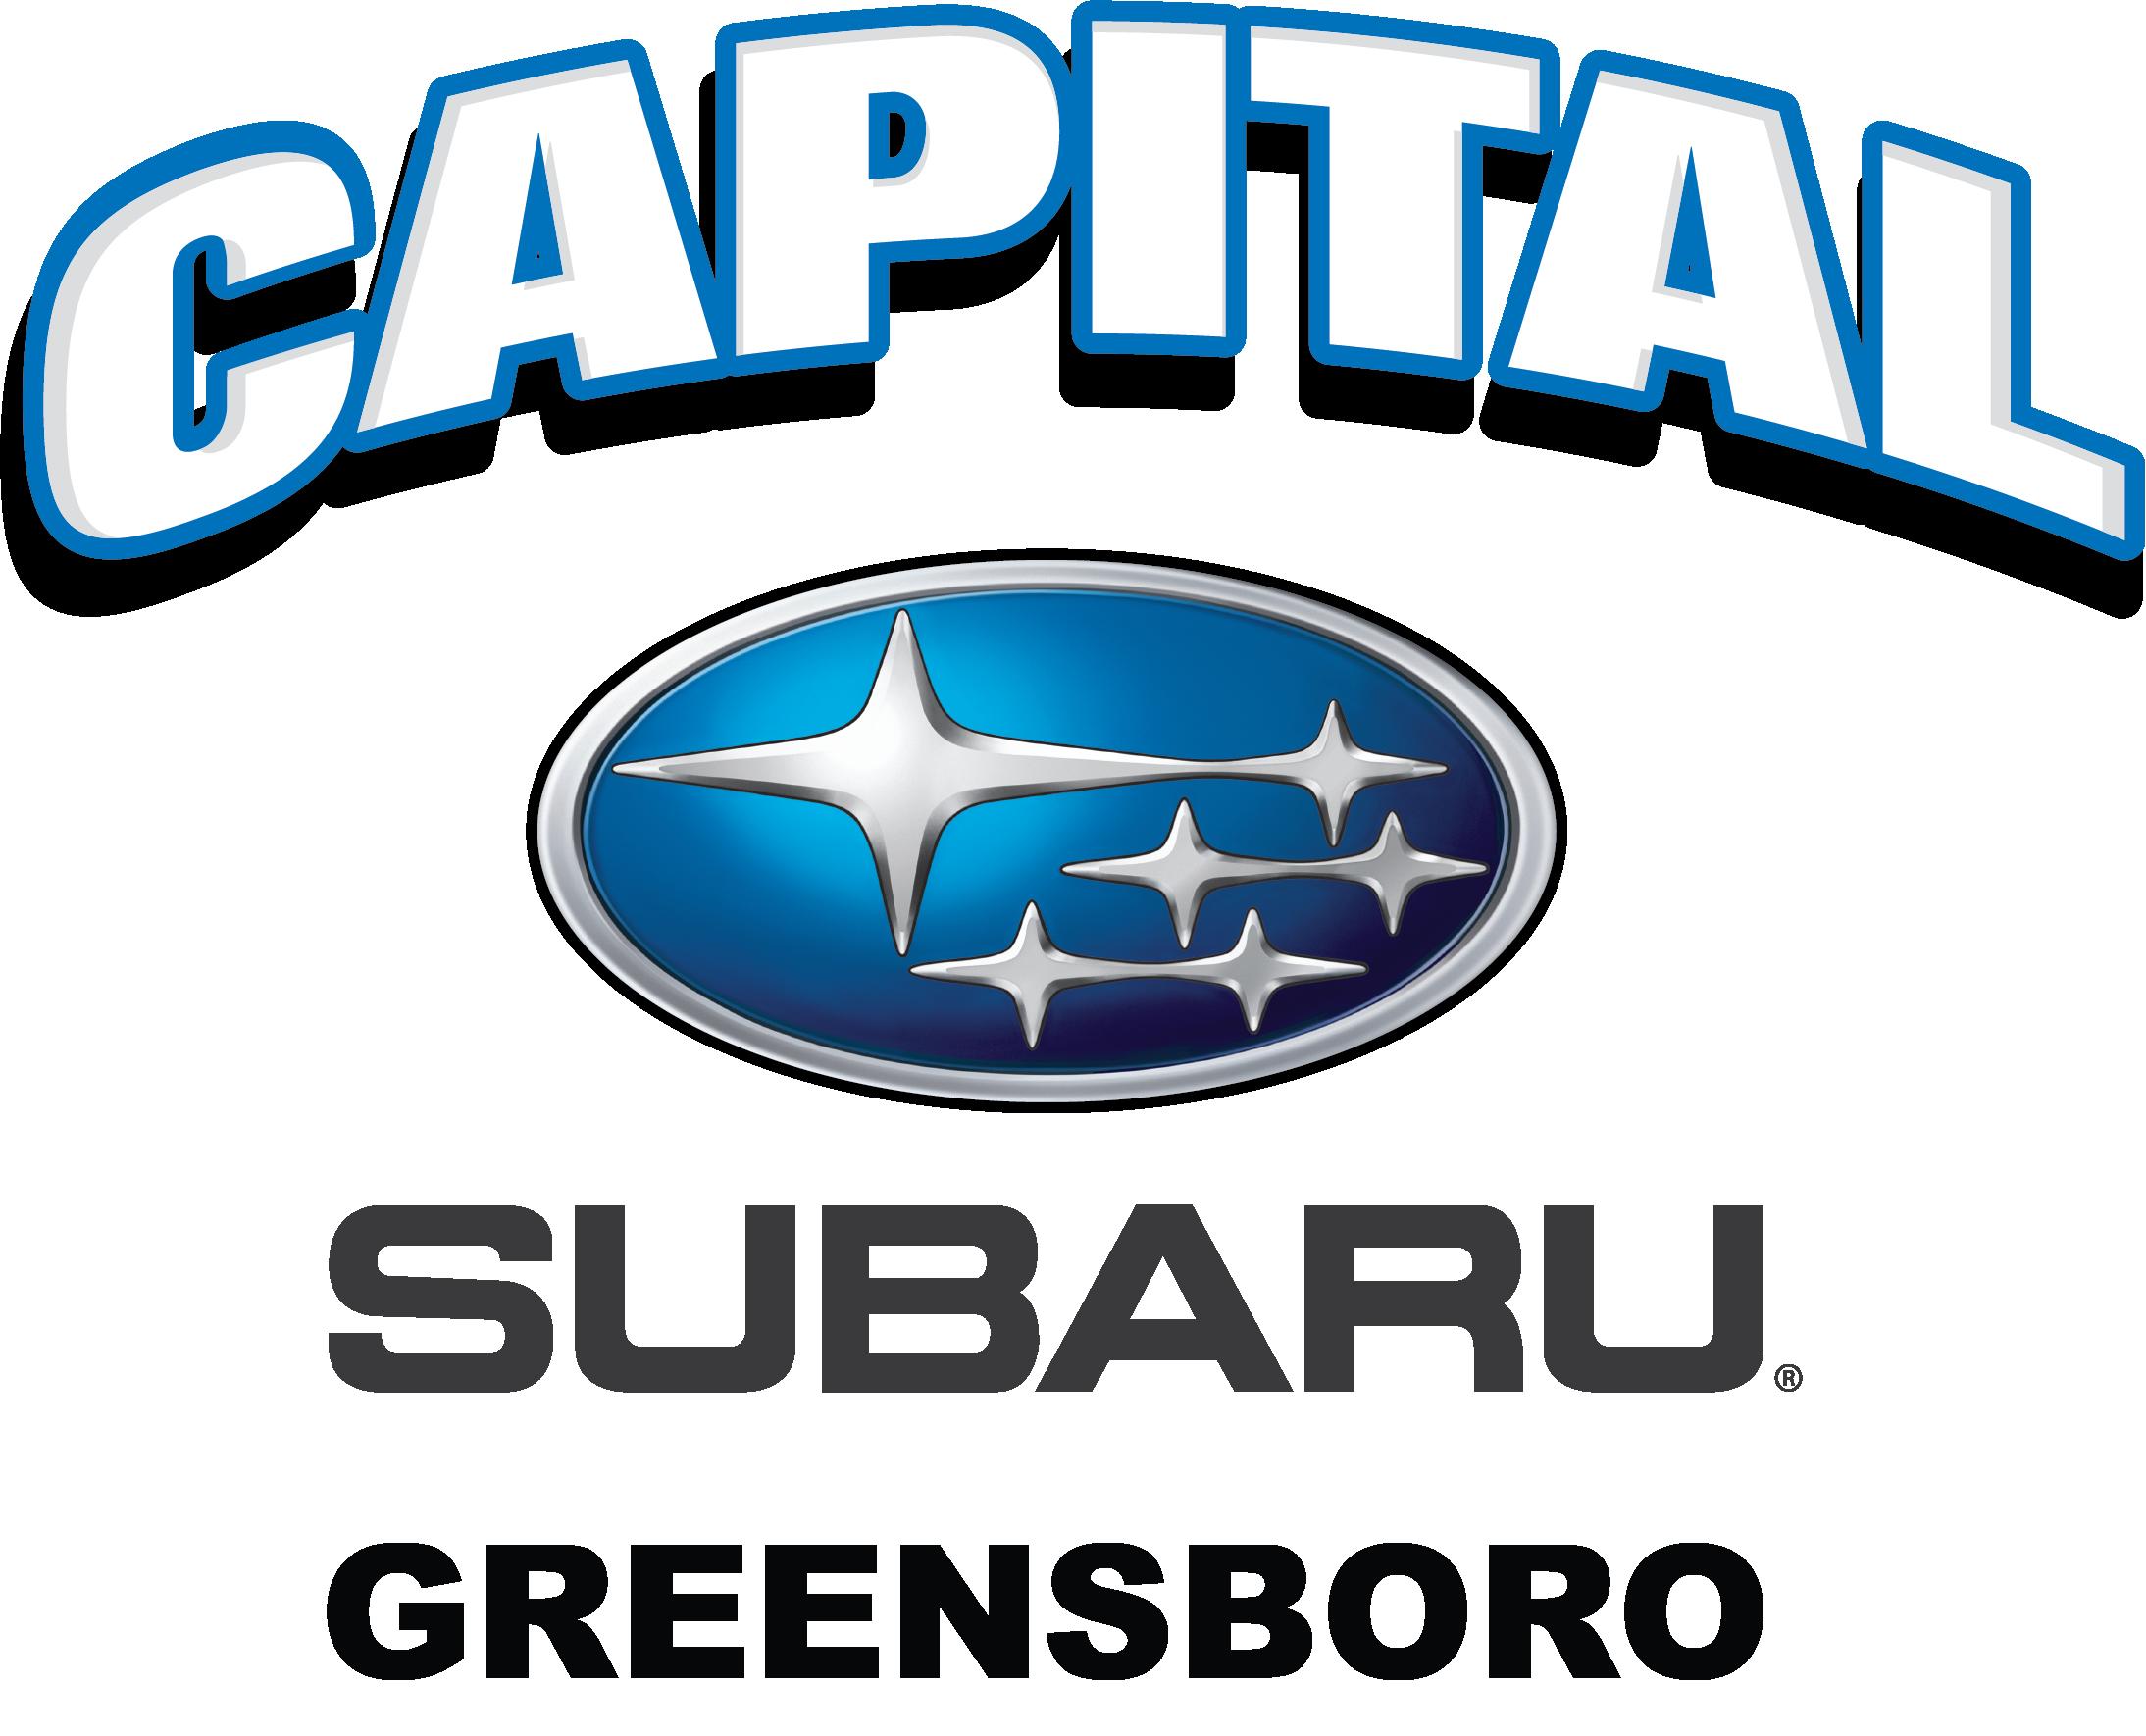 Capital Subabru Greensboro Logo